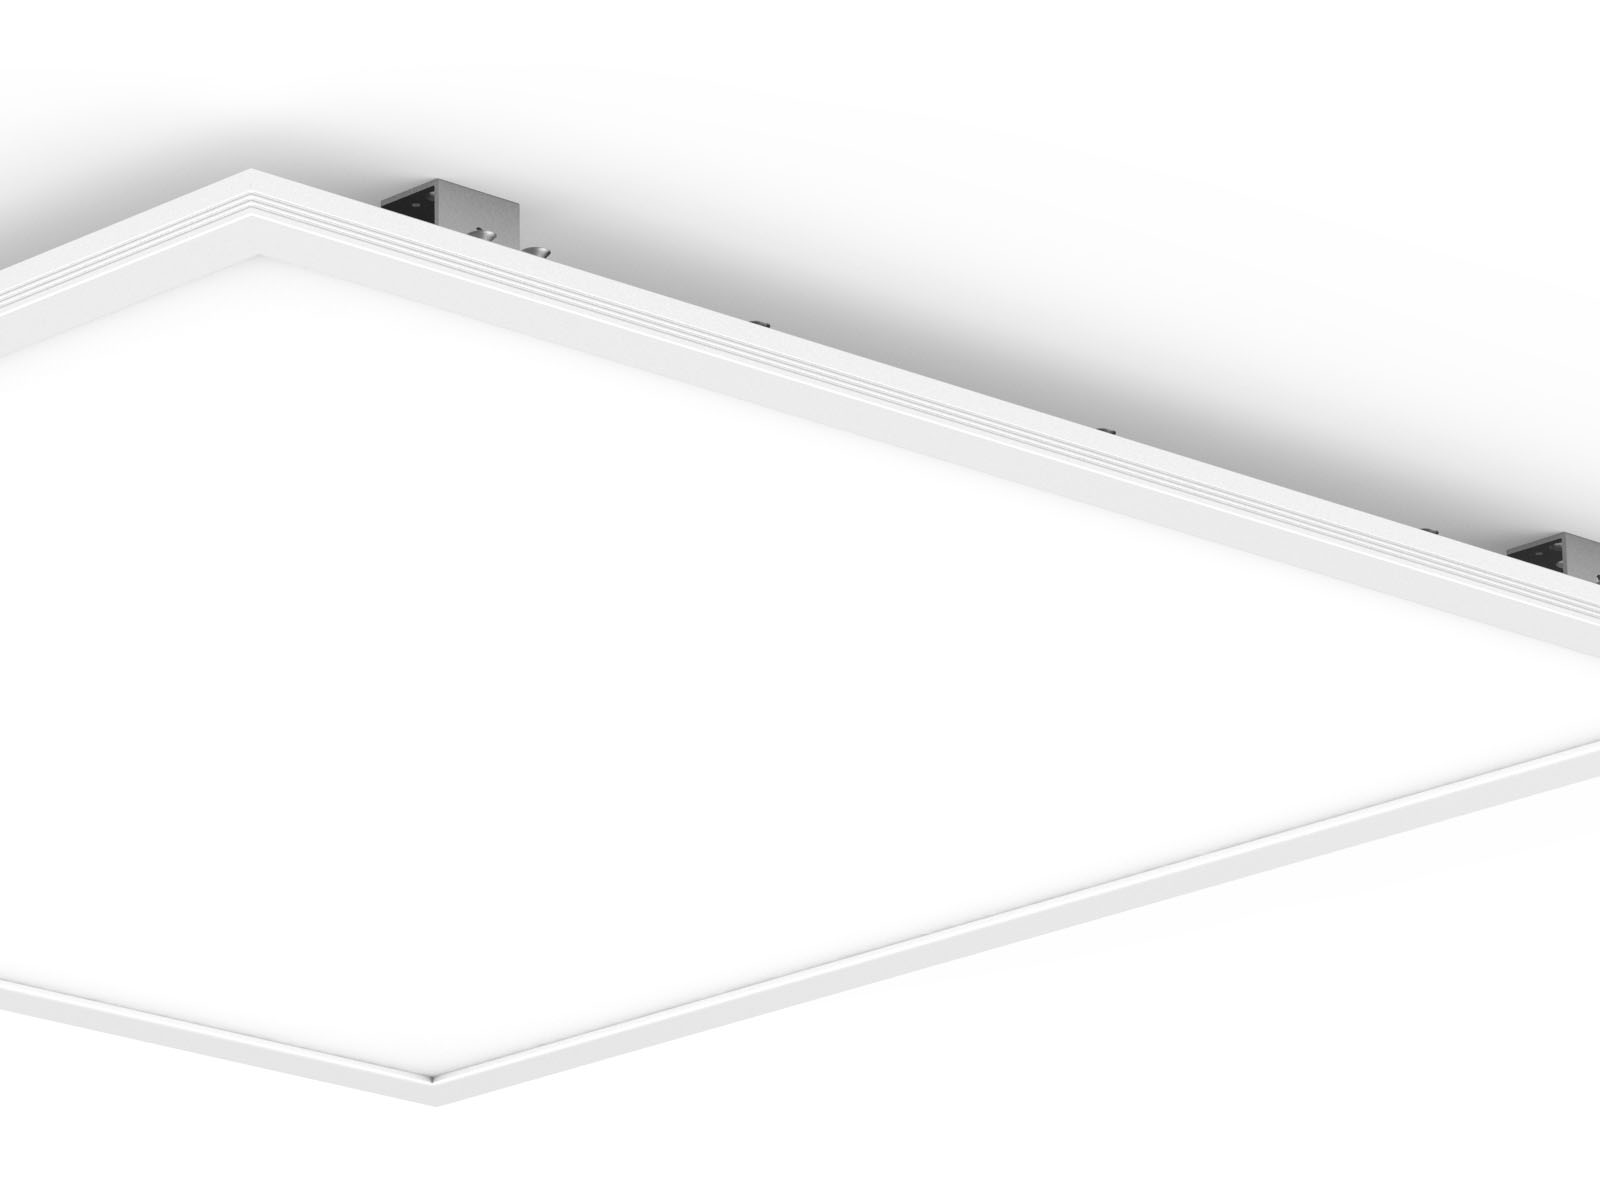 Tuv led flat panel lights upshine lighting suspended pl3030 2 led panel lights dailygadgetfo Choice Image